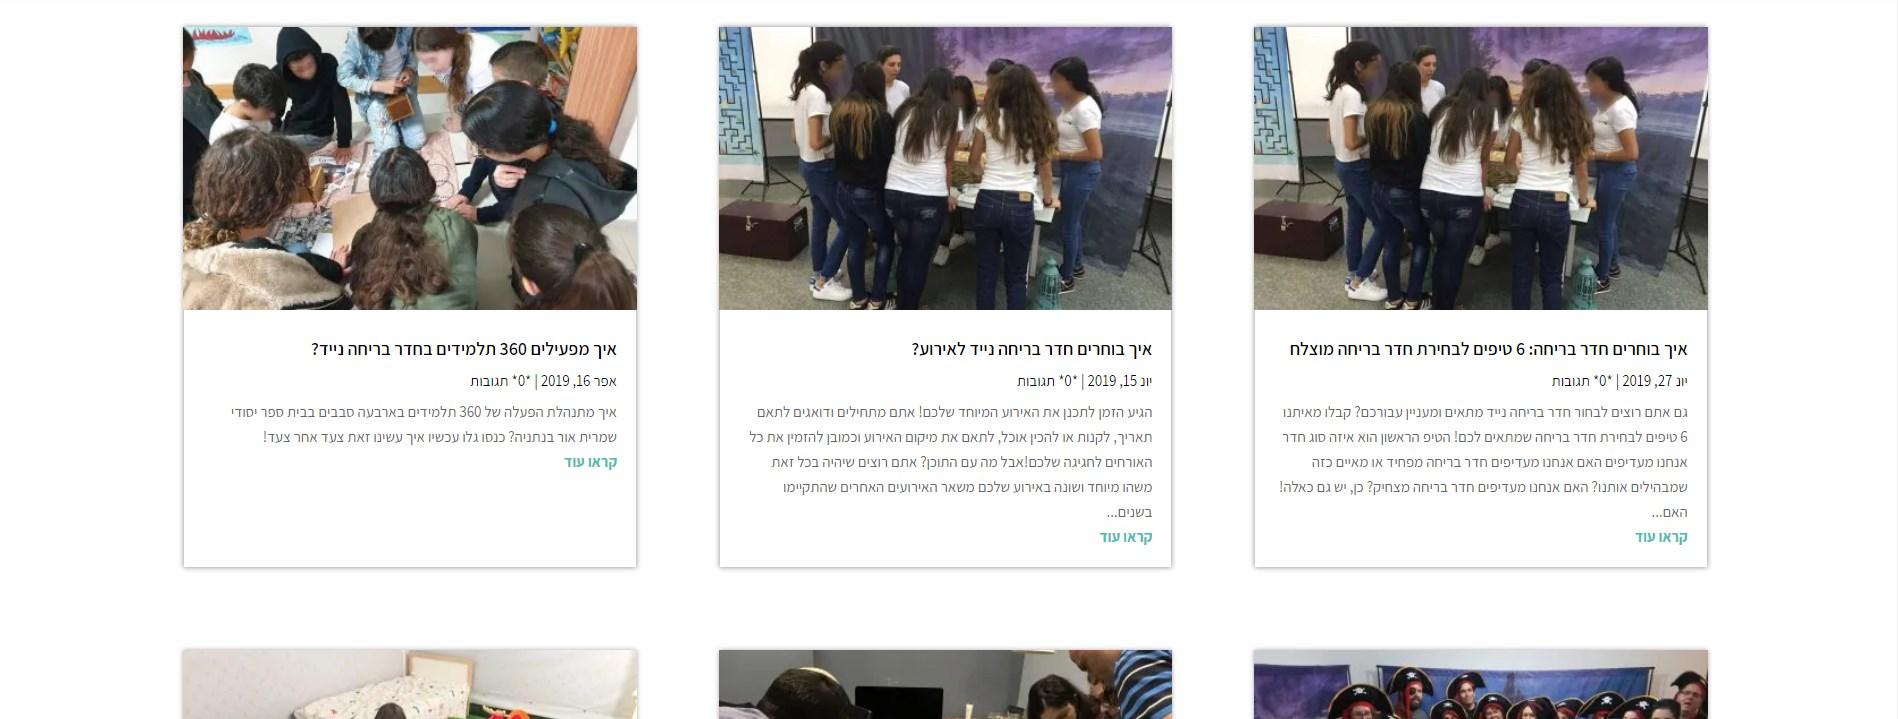 Columnas del blog de Divi igualadas